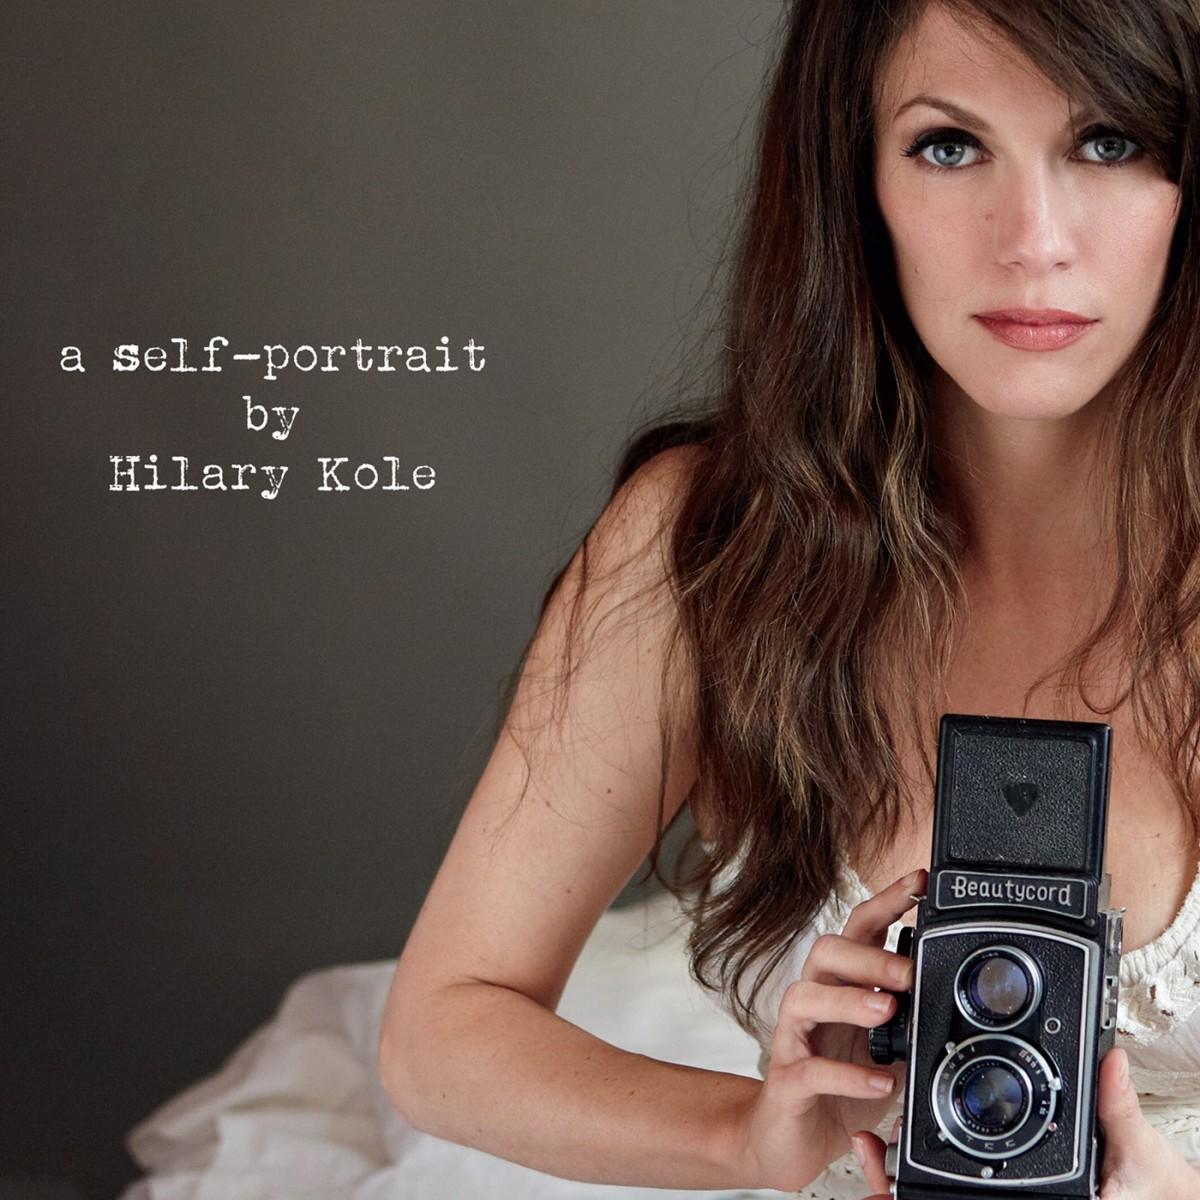 A Self-Portrait cover Image final